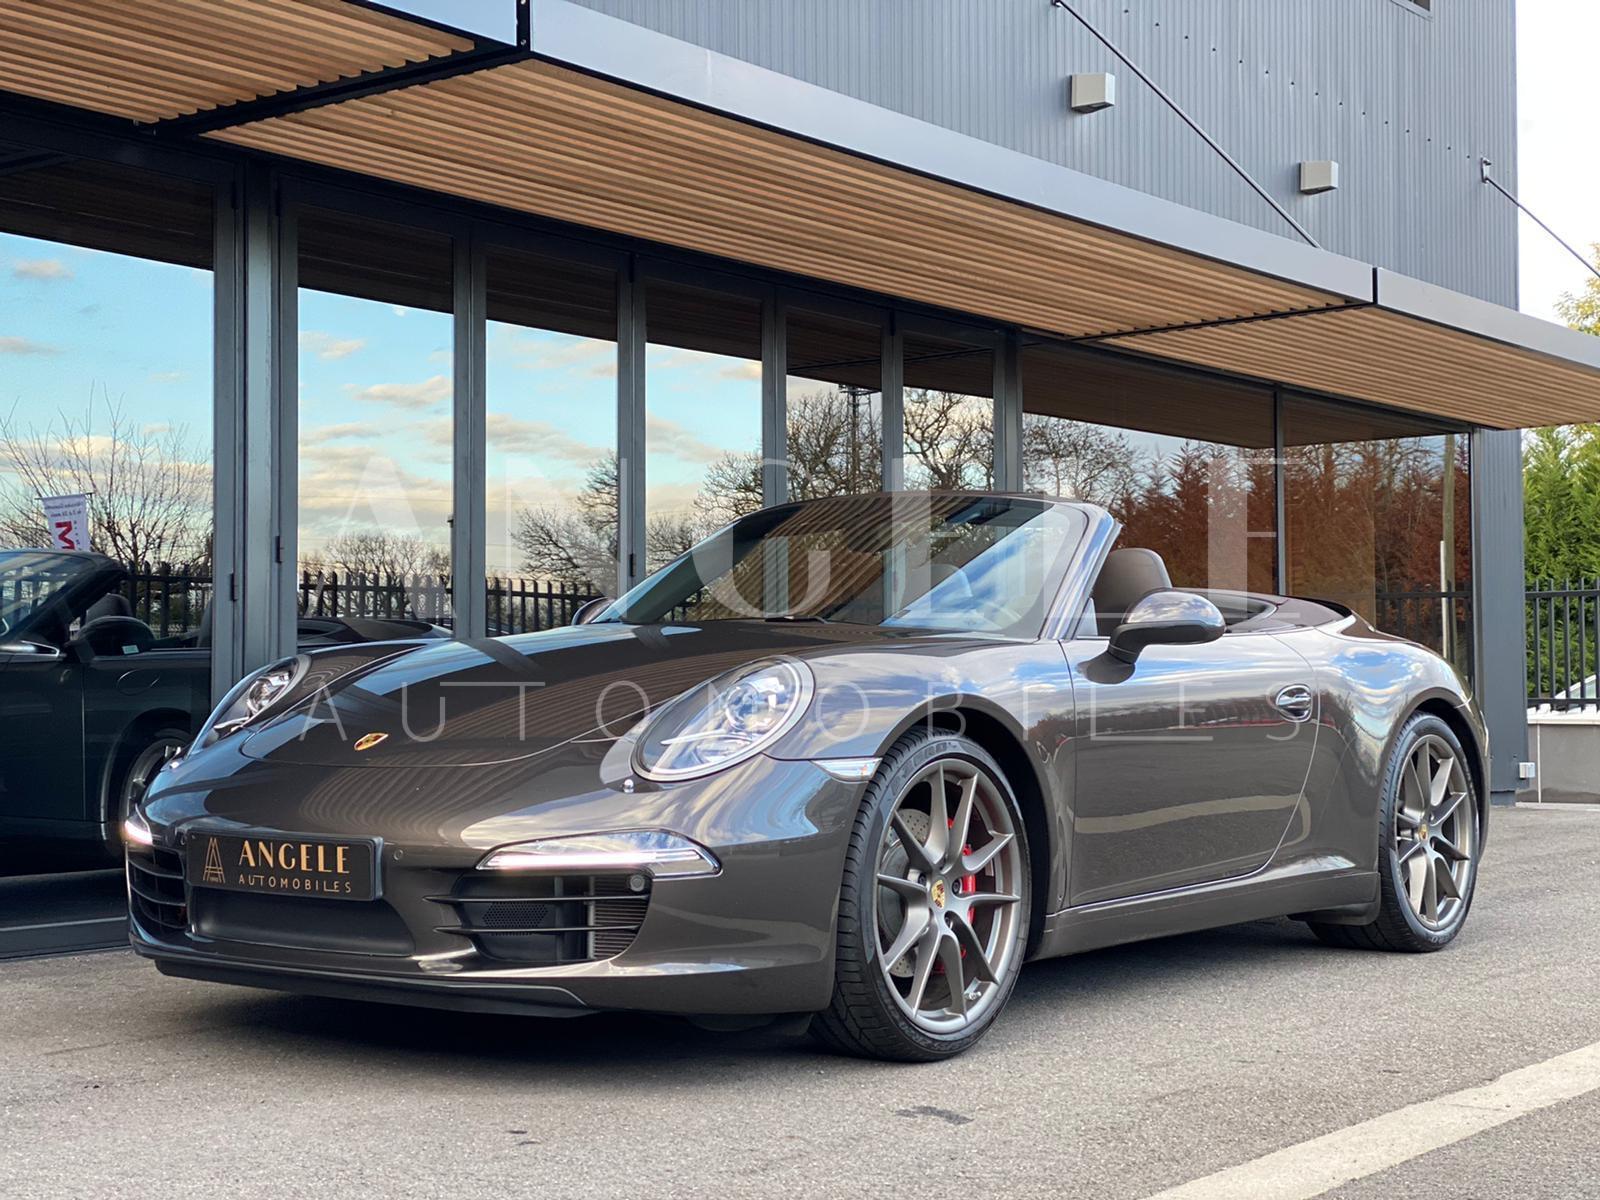 Porsche 911 cabriolet - Angelé Automobiles